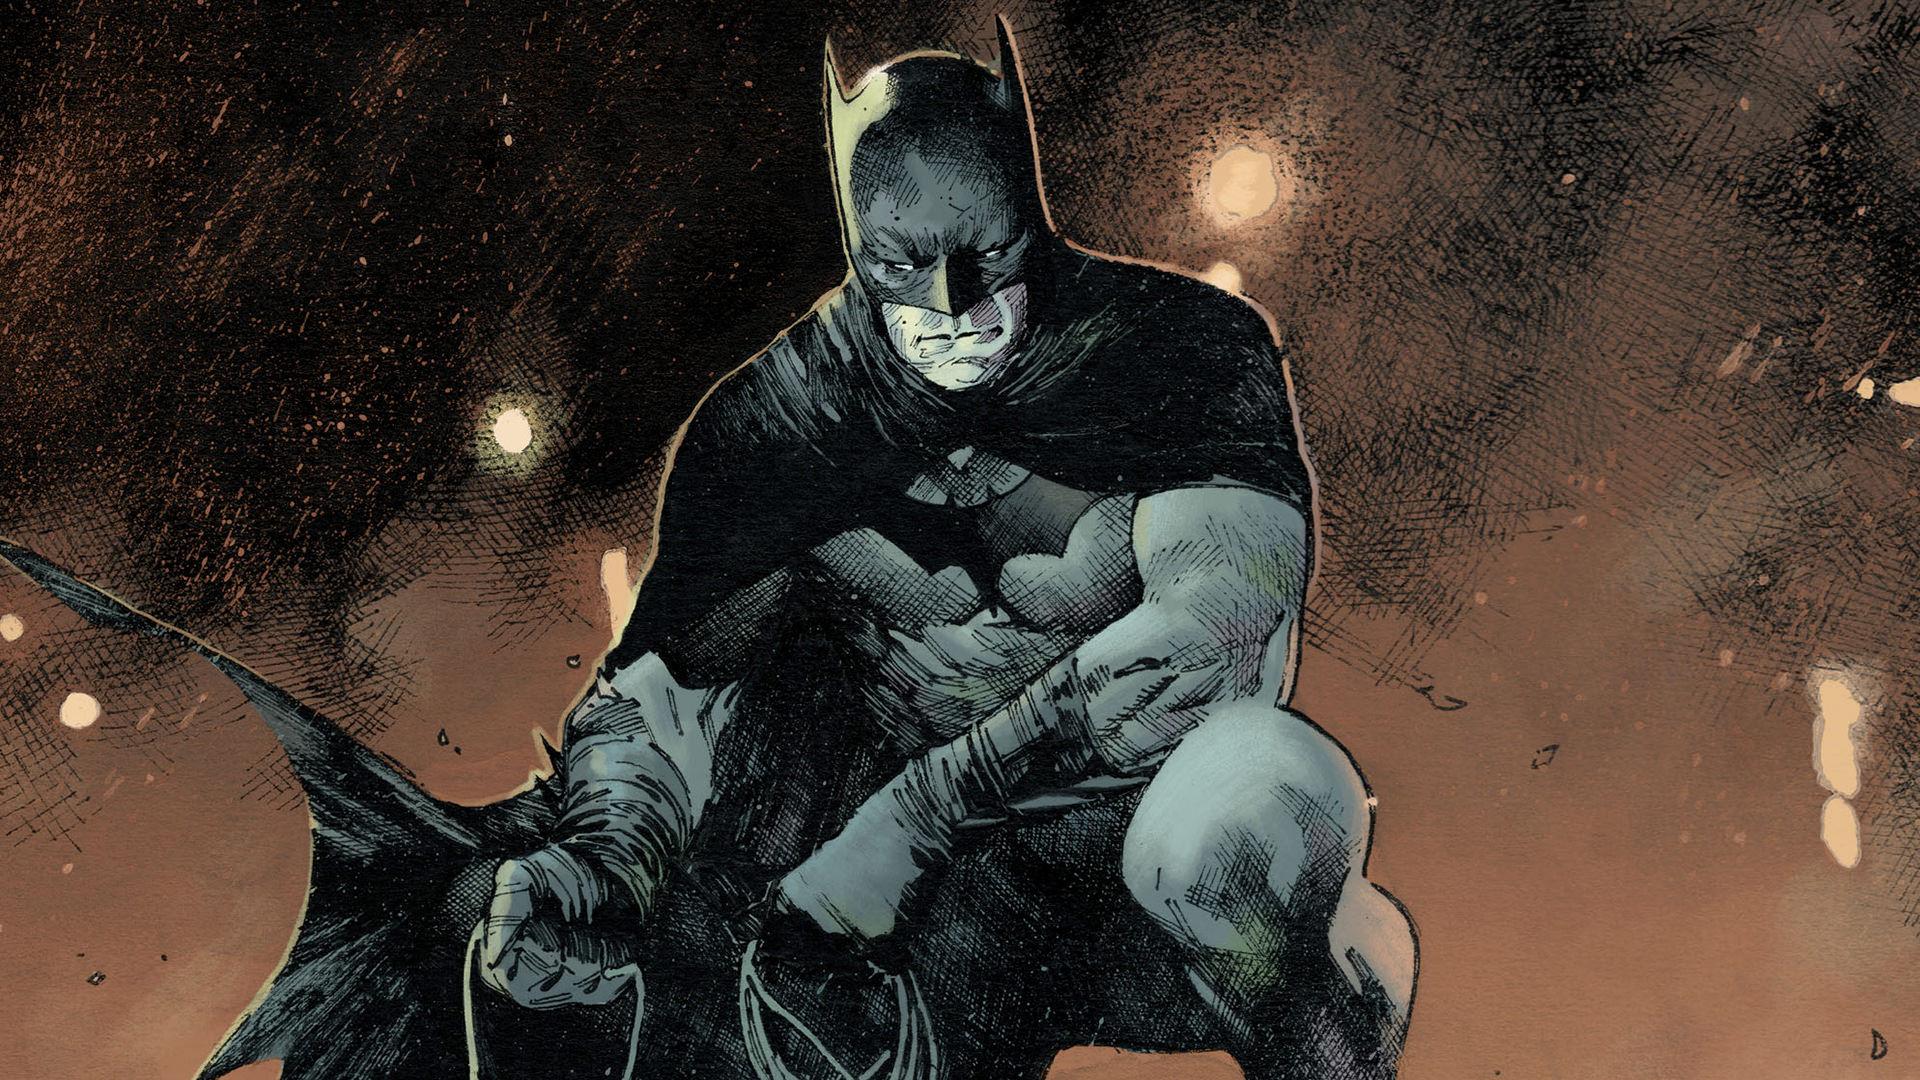 batman comic art, hd superheroes, 4k wallpapers, images, backgrounds